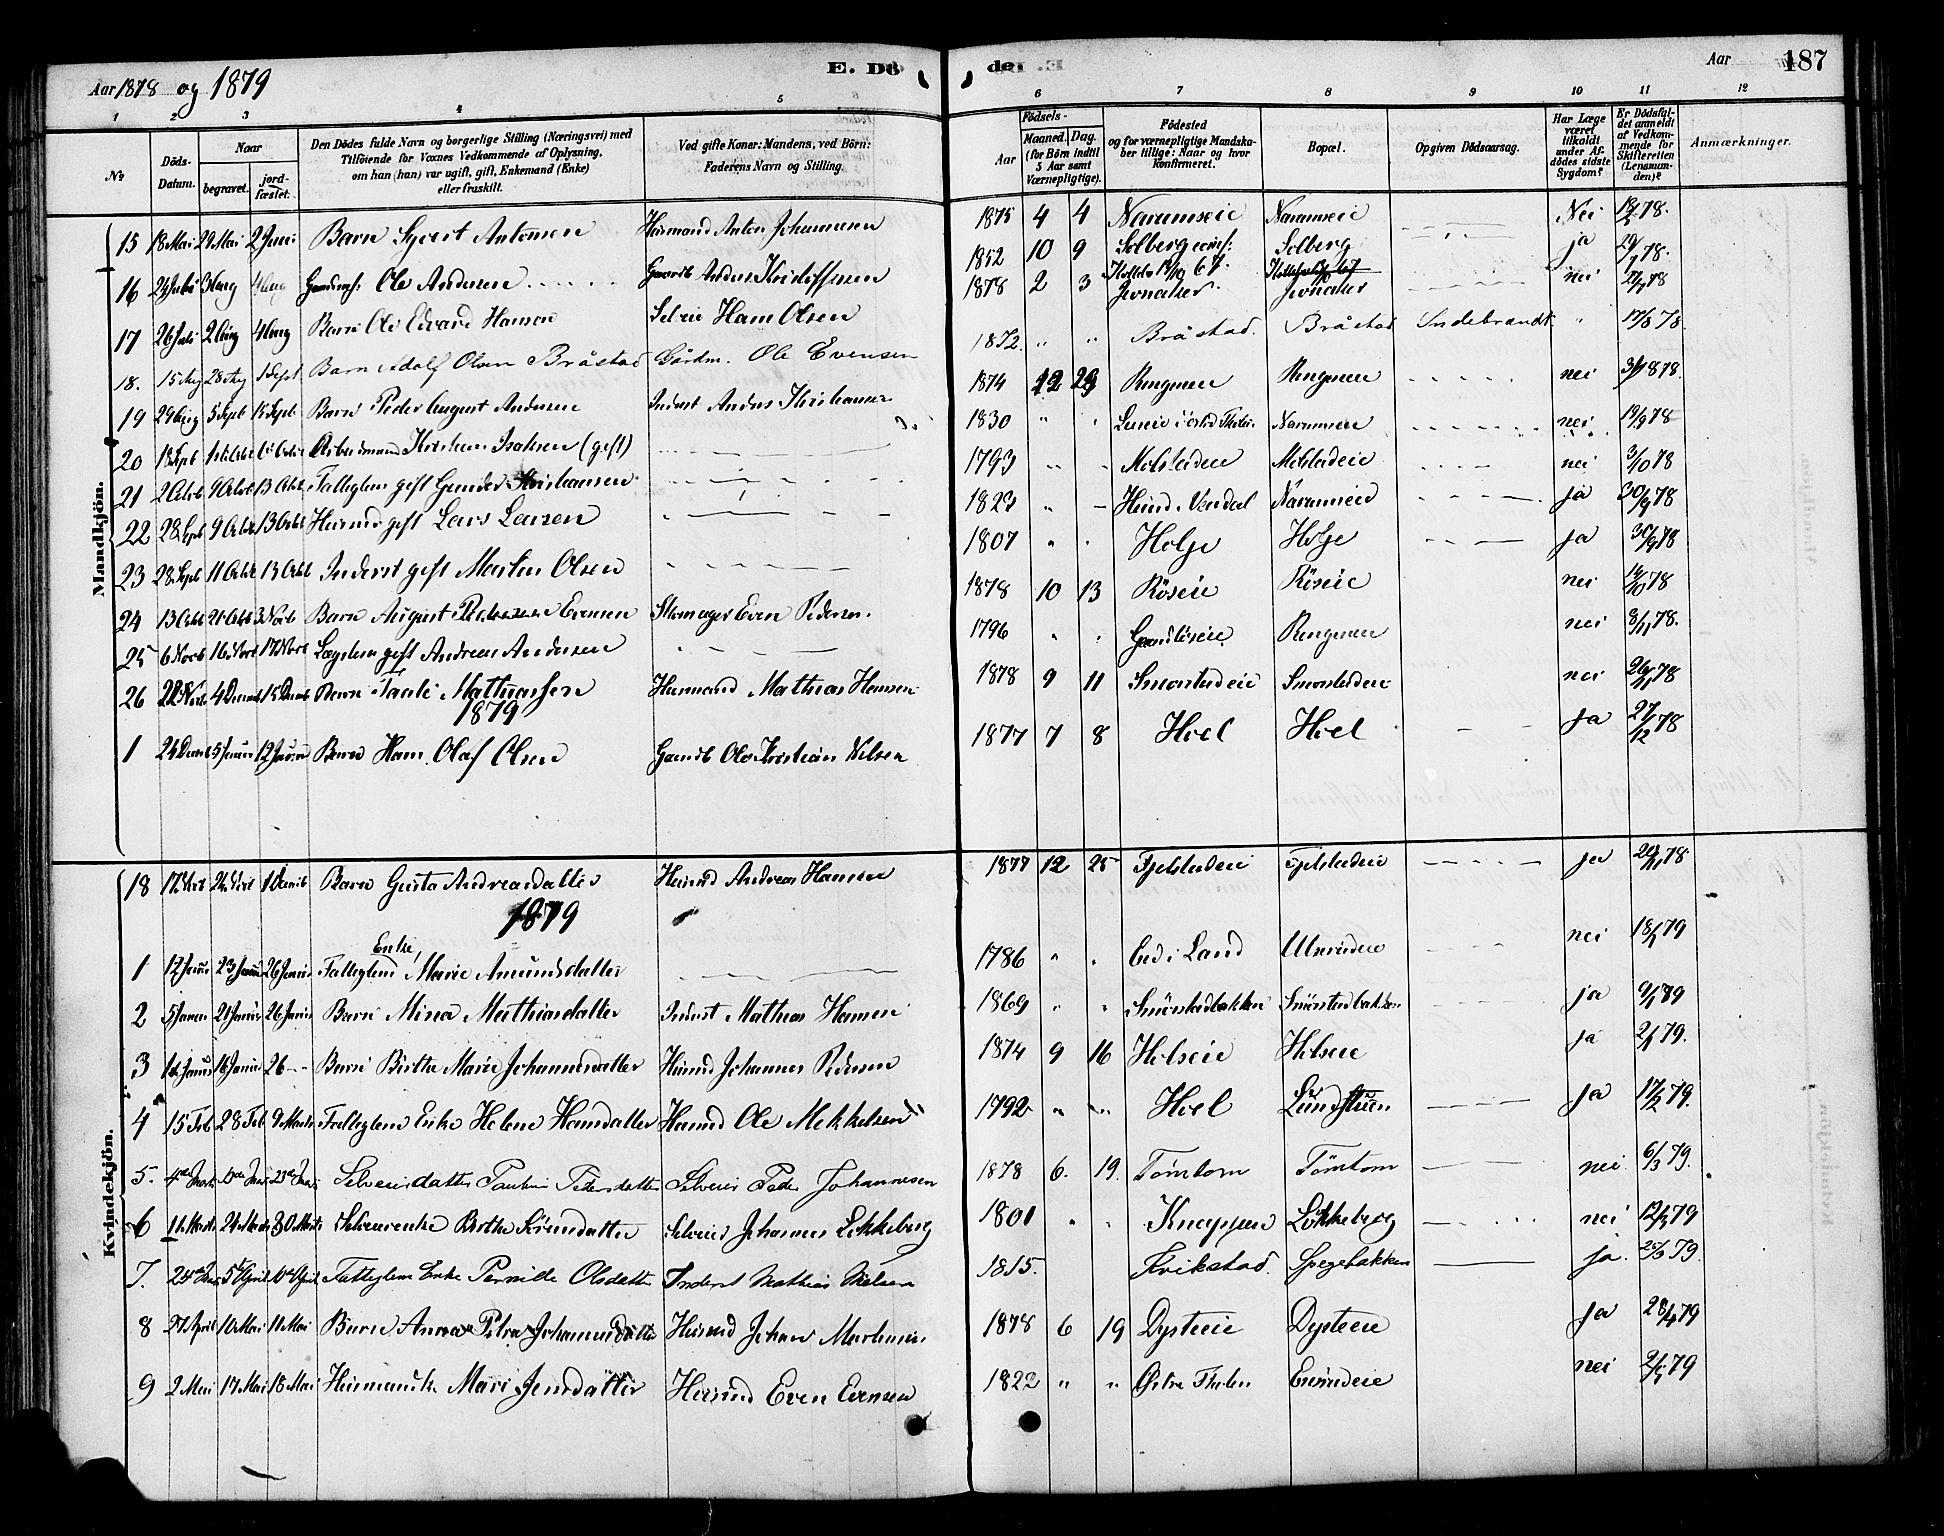 SAH, Vestre Toten prestekontor, H/Ha/Haa/L0010: Ministerialbok nr. 10, 1878-1894, s. 187